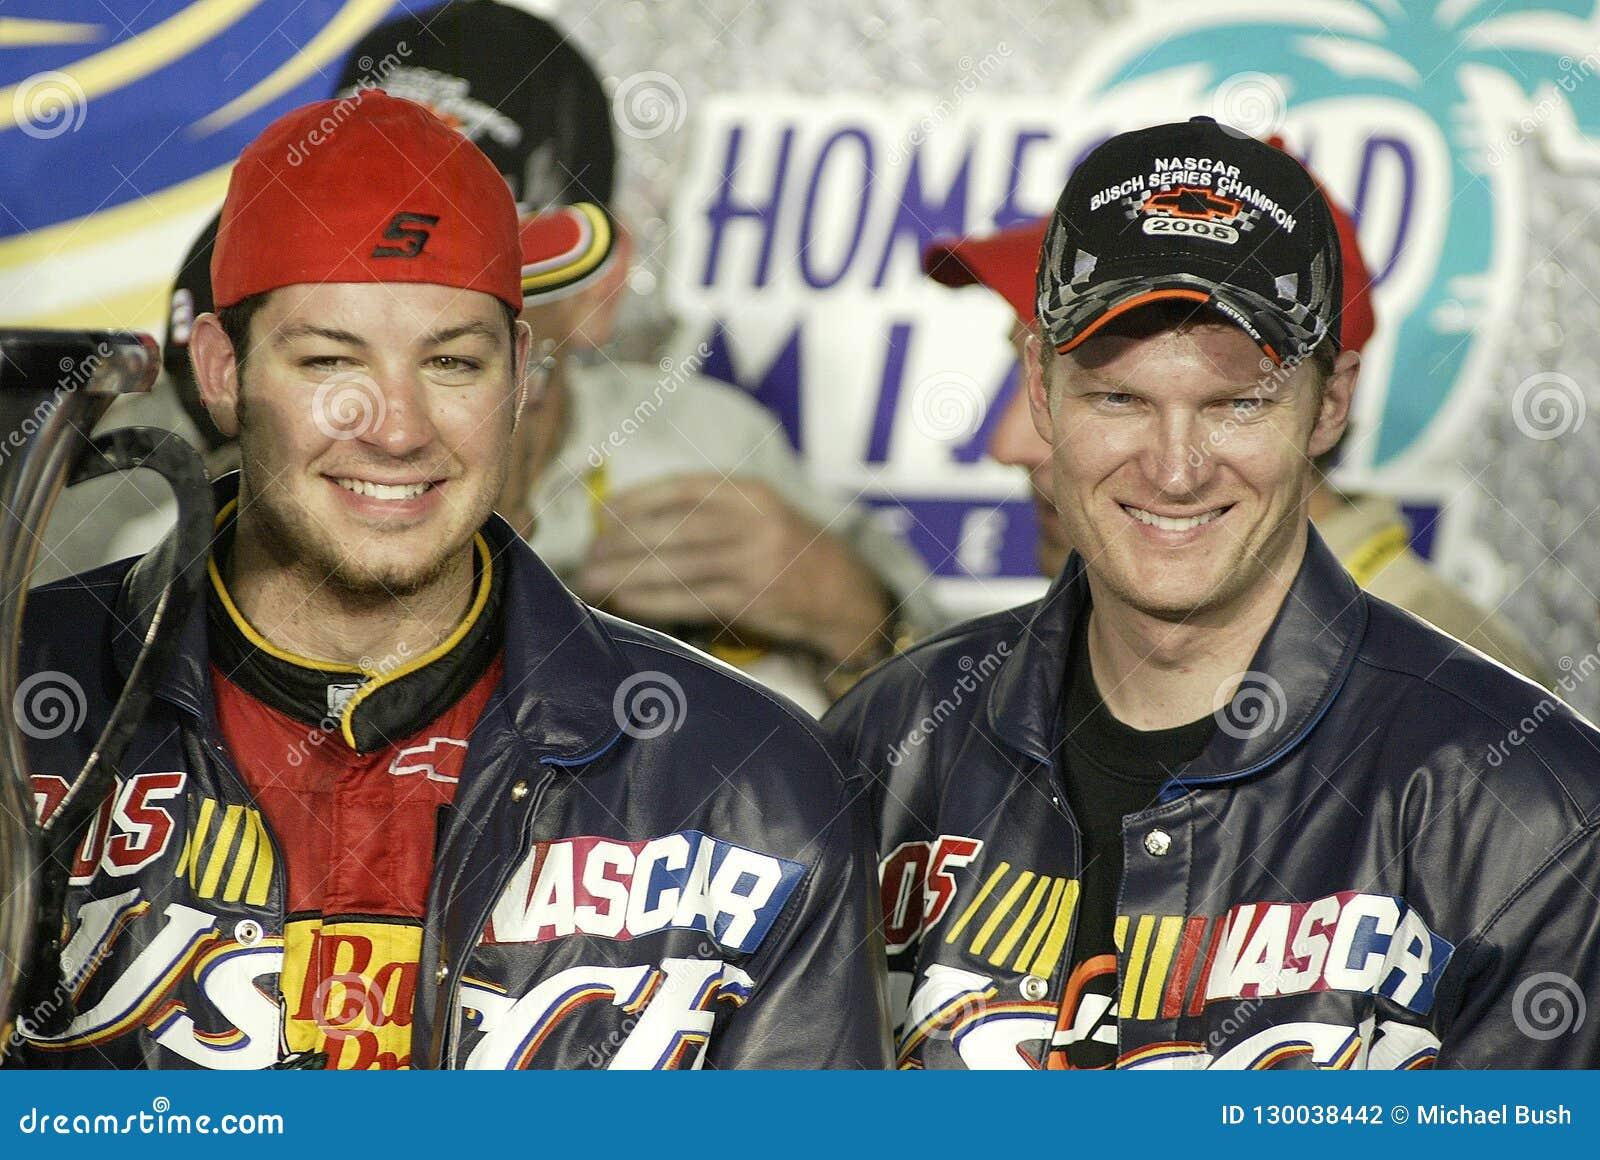 JR de Dale Earnhardt del programa piloto de NASCAR